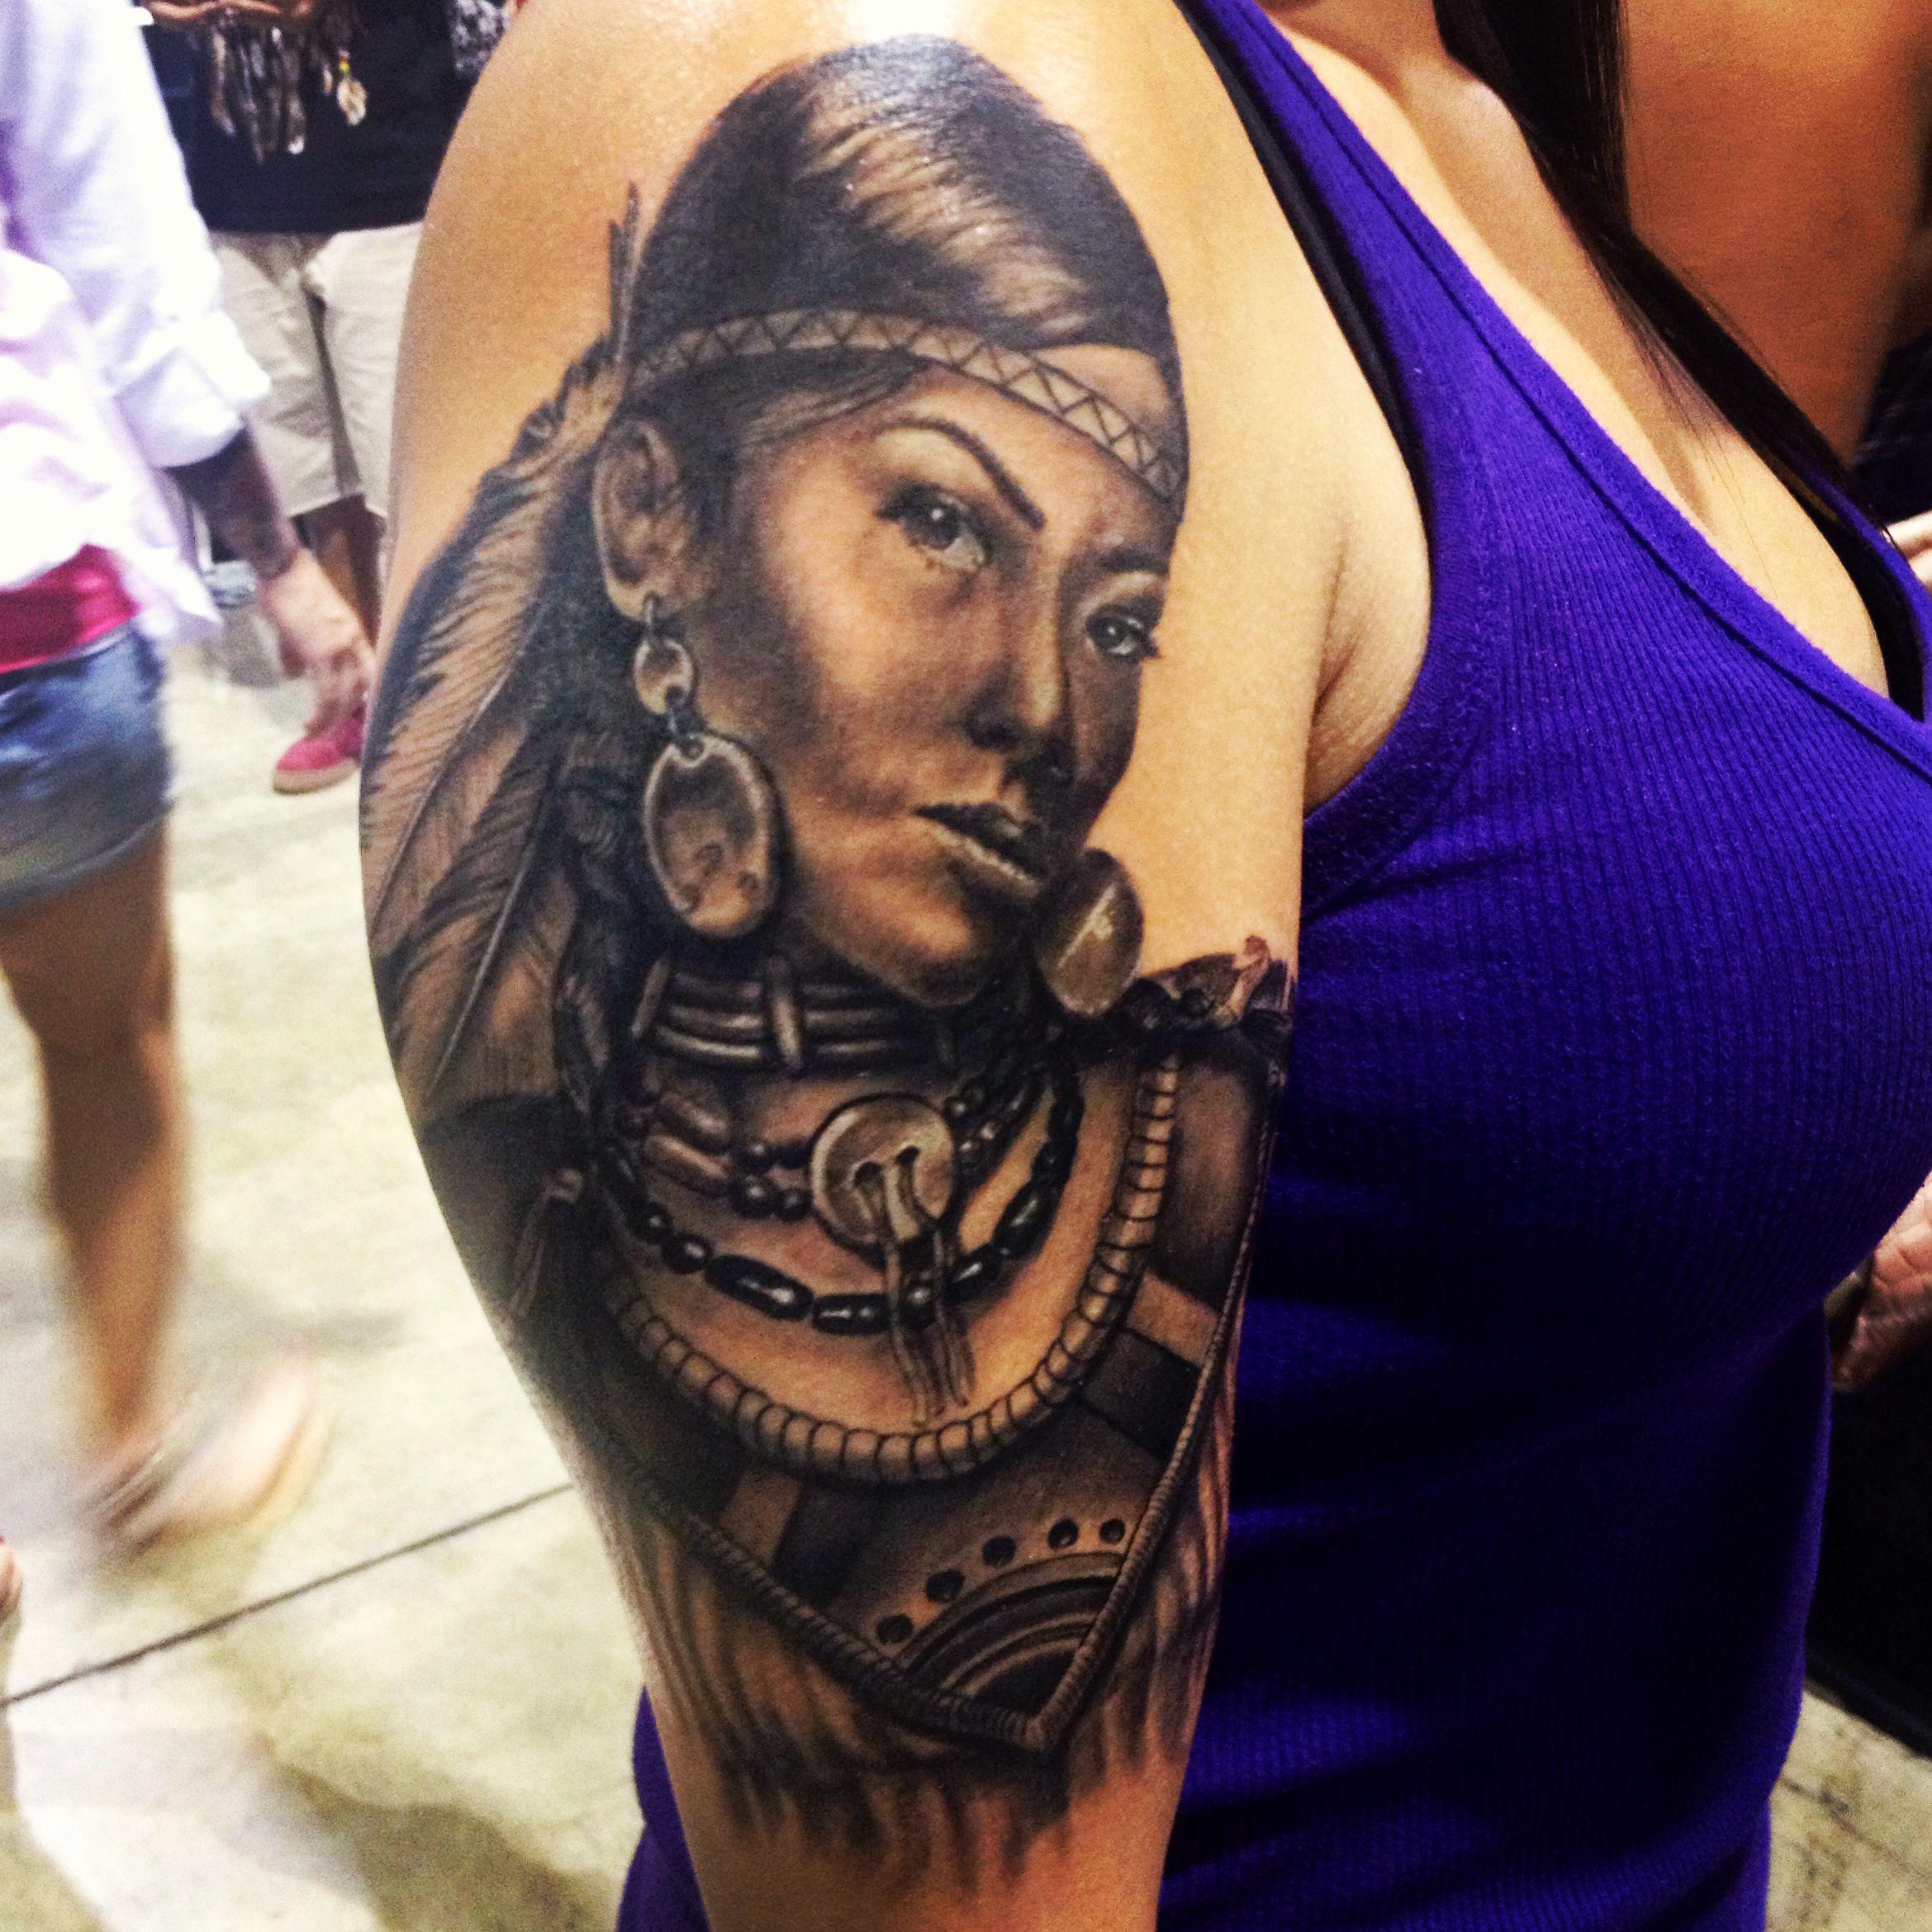 Native American woman tattoo Human Canvas Pinterest